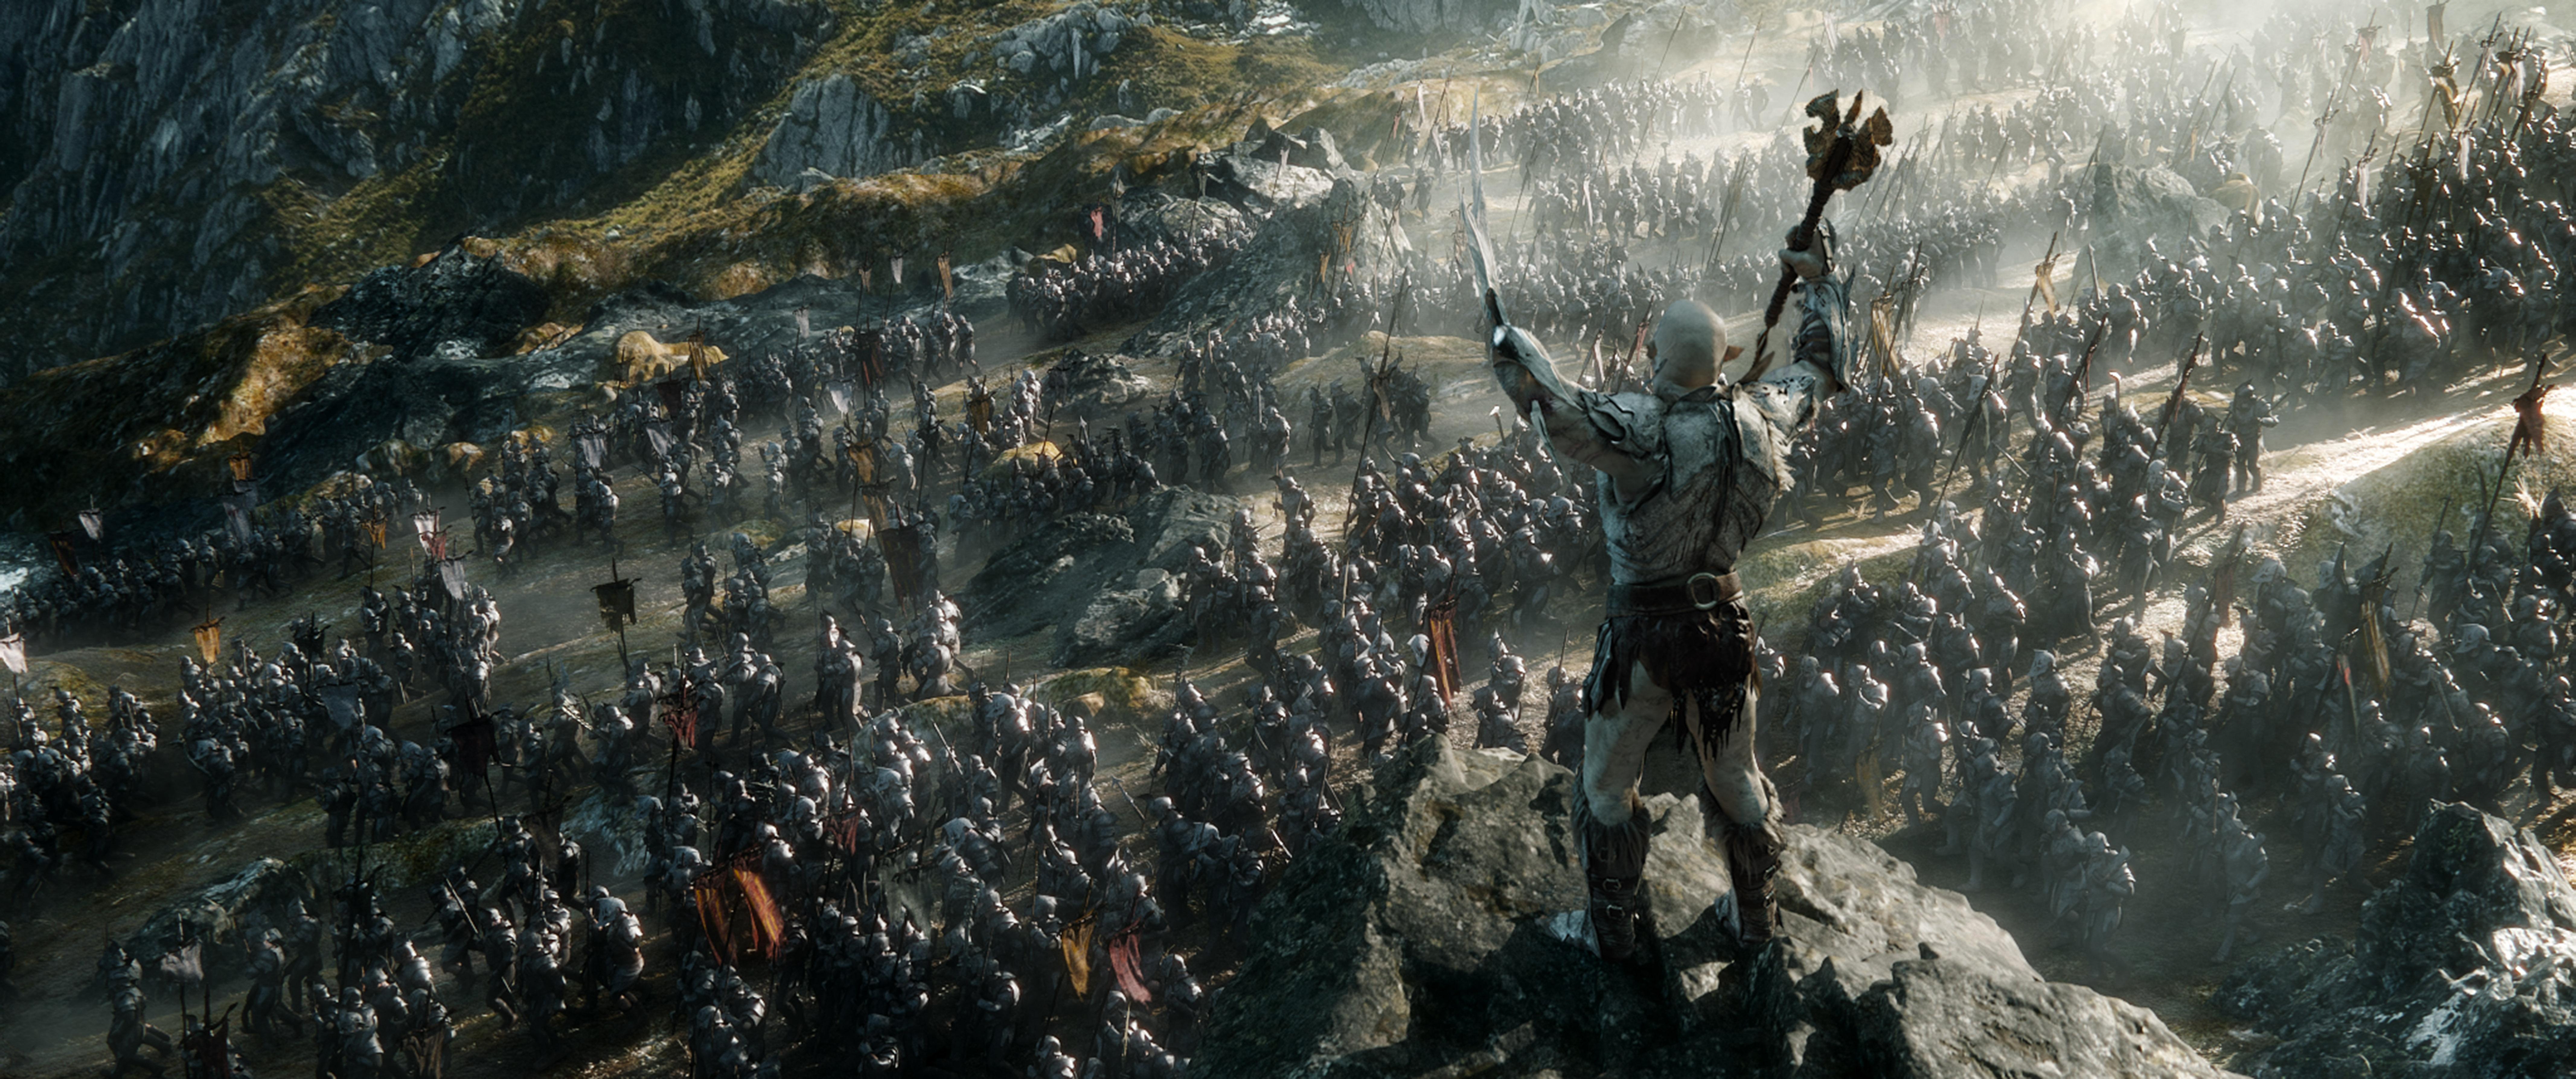 The Hobbit Battle Of Five Armies Wallpaper 4